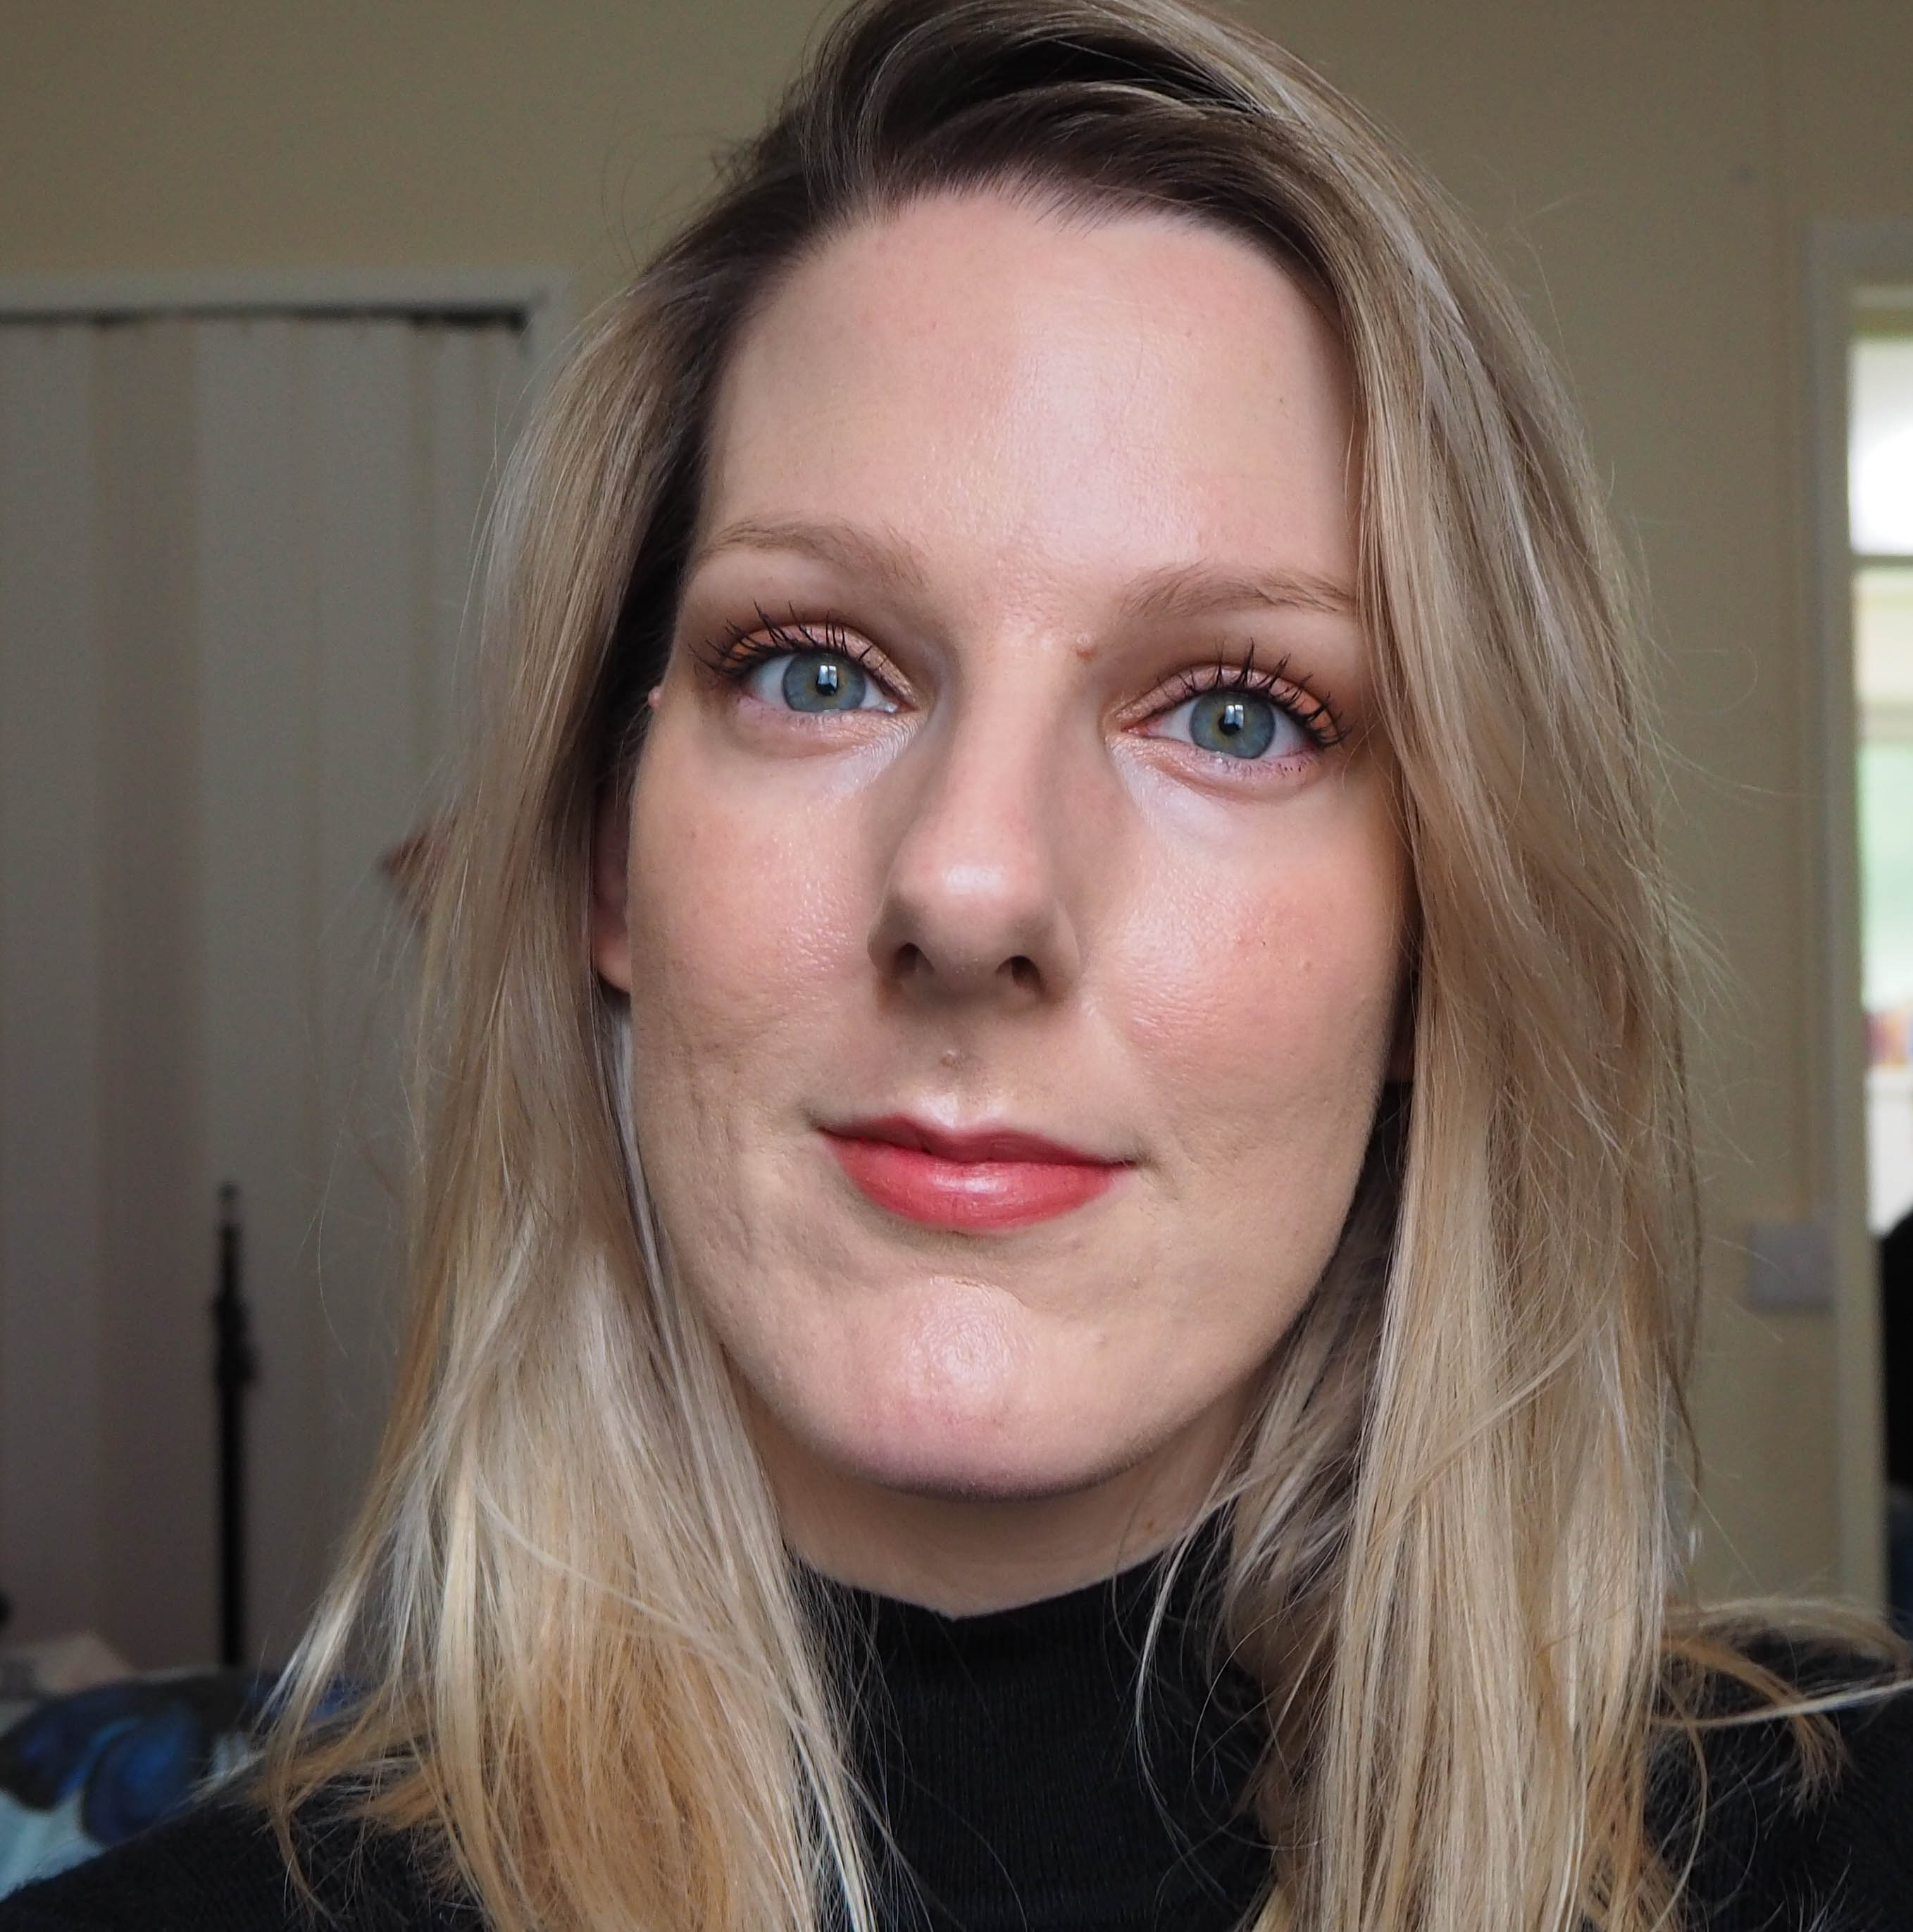 Charlotte Tilbury Airbrush Flawless Foundation FOTD